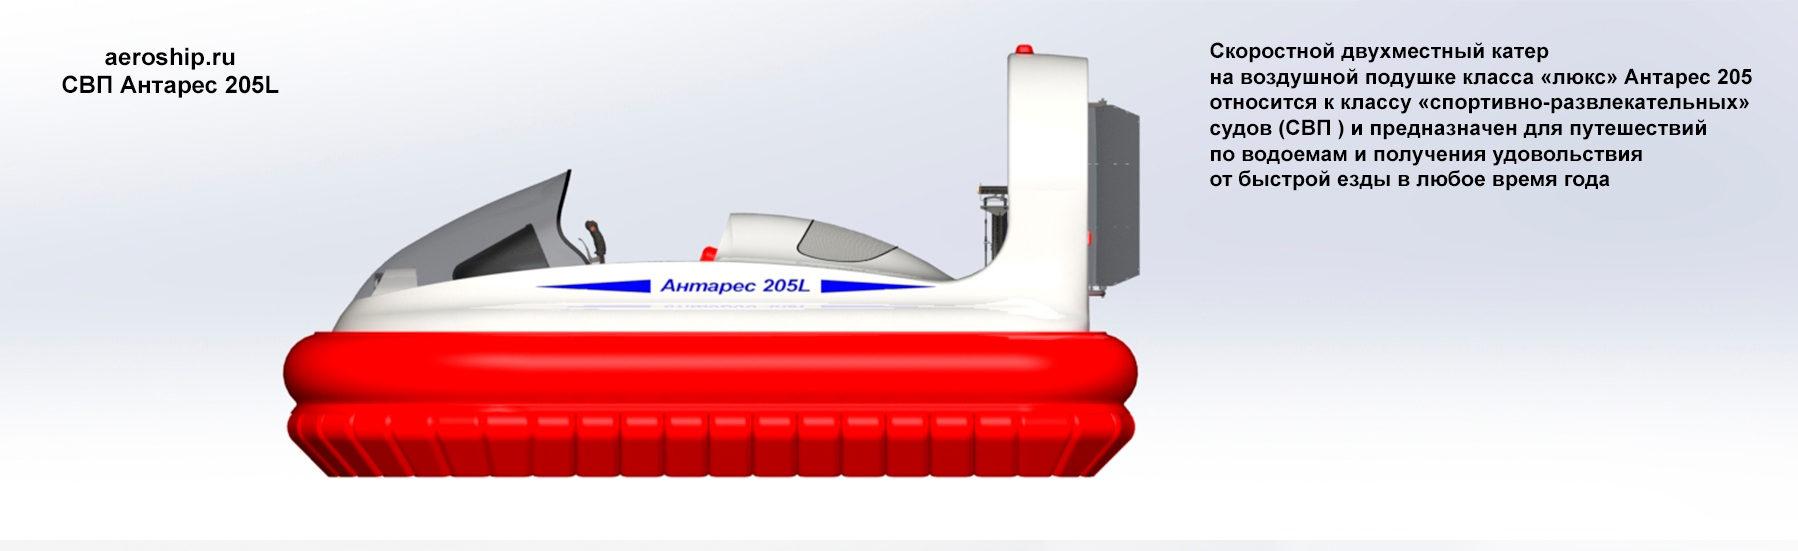 Судно на воздушной подушке Антарес 205L Продажа, изготовление